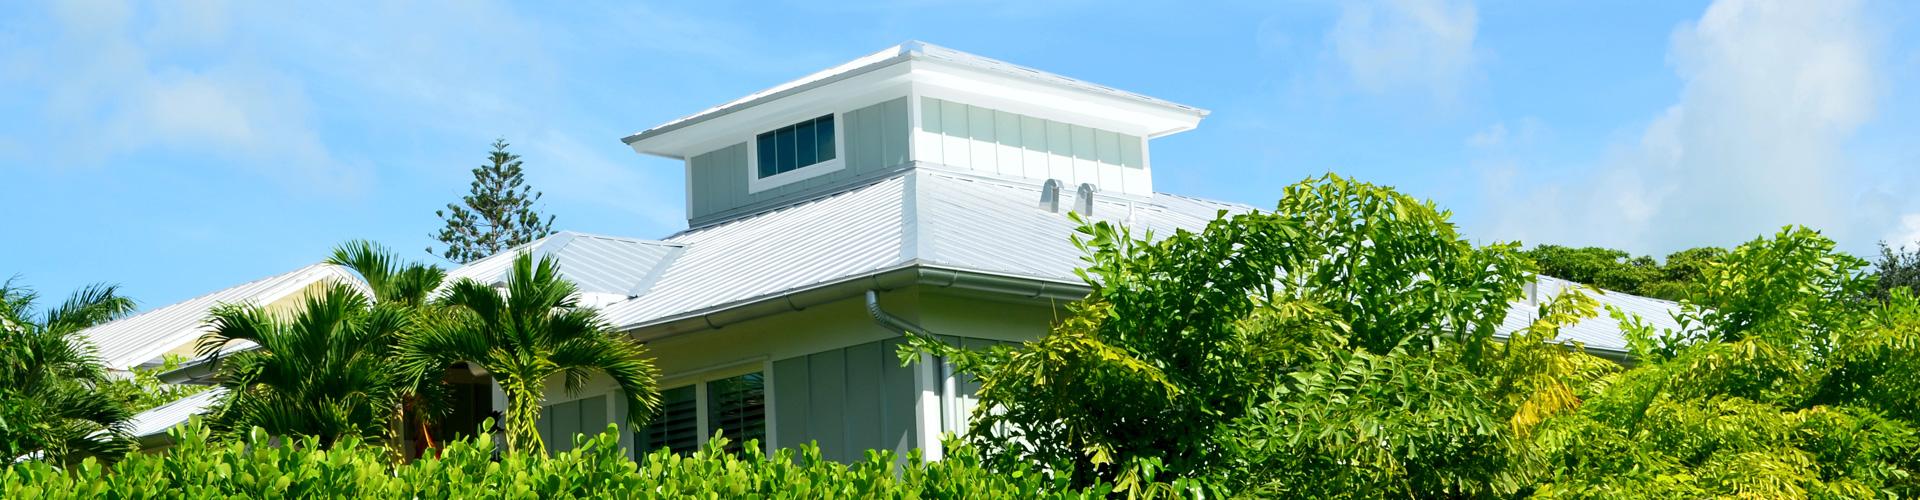 Metal Roofing Hurricane Proof in Naples, Florida